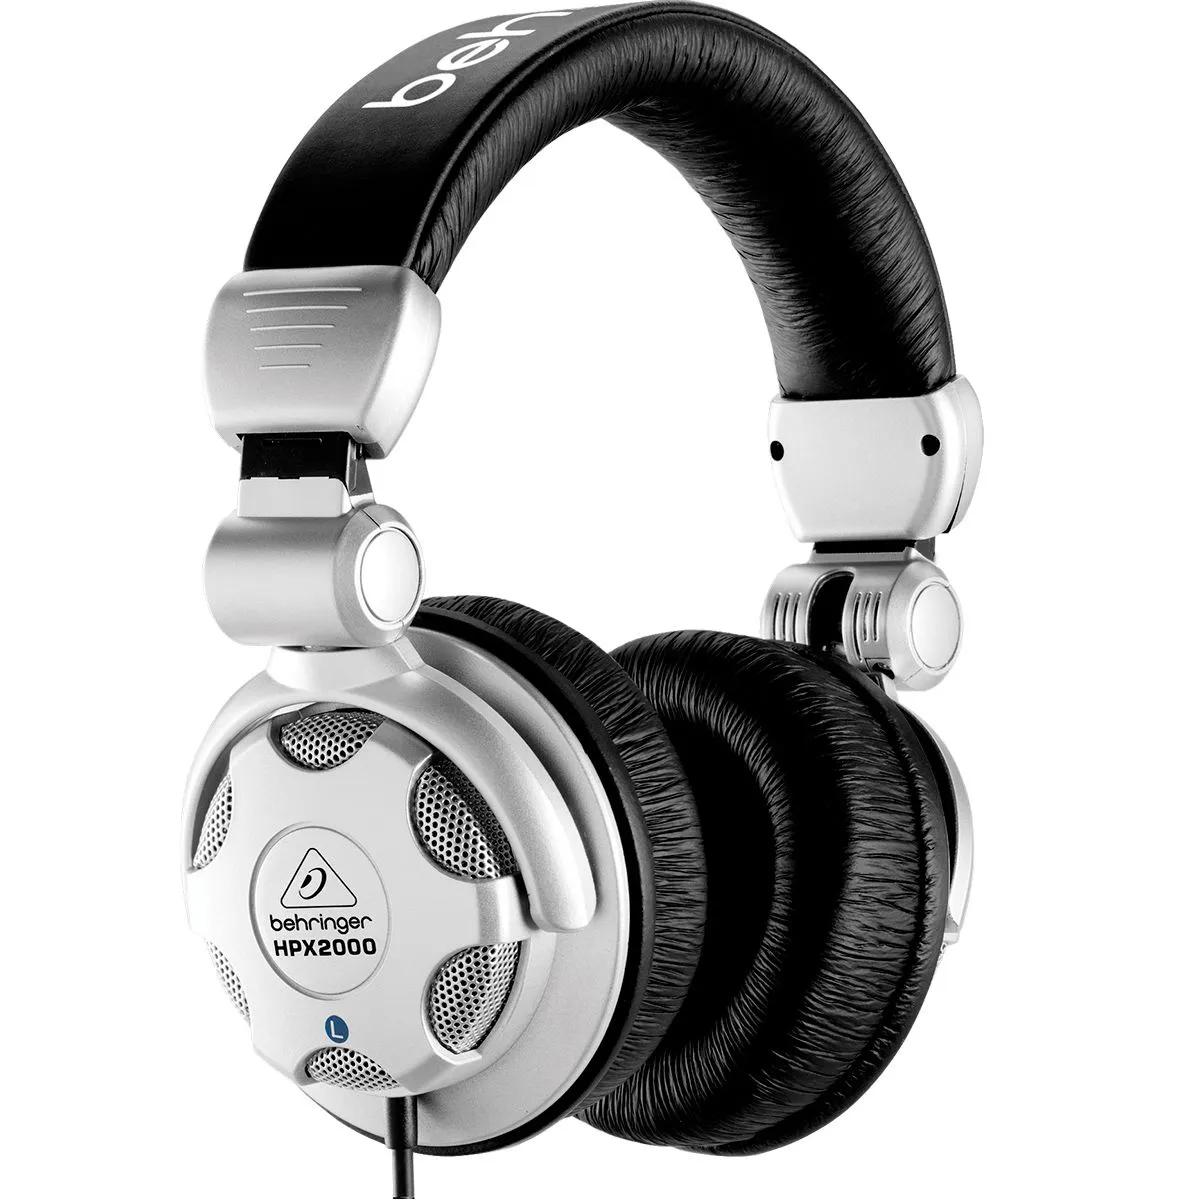 Fone de Ouvido Behringer HPX2000 High Definition Over Ear